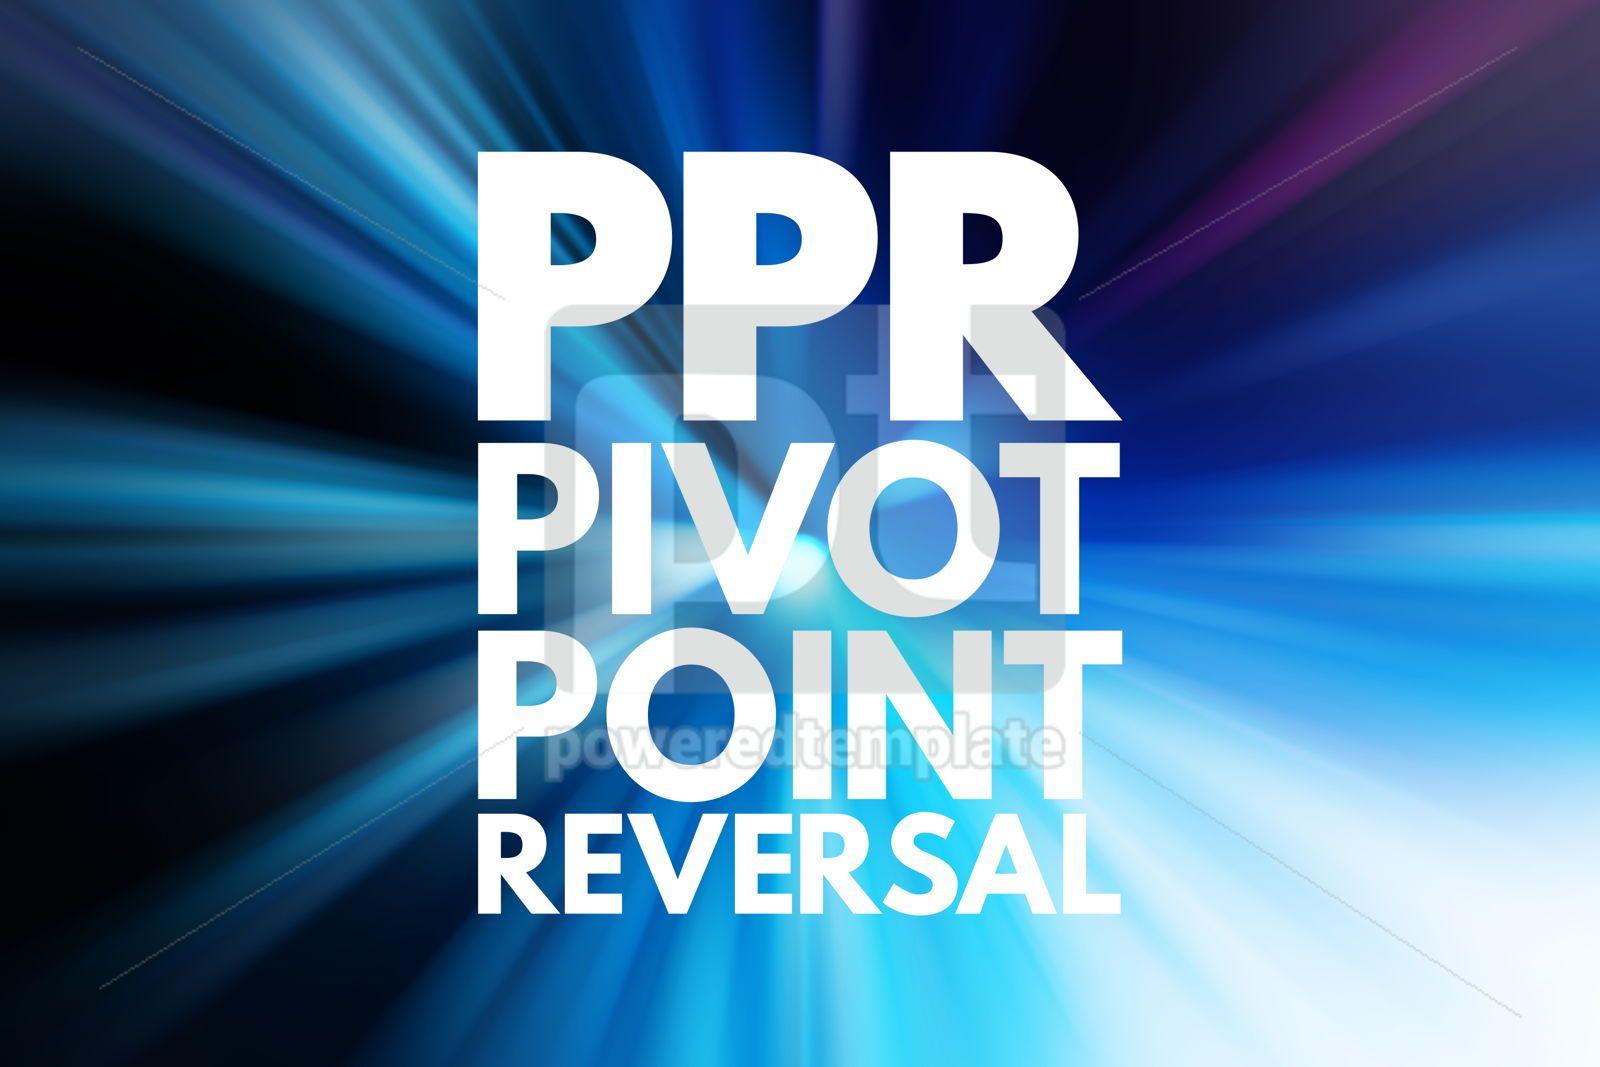 PPR - Pivot Point Reversal acronym business concept background, 16087, Business — PoweredTemplate.com